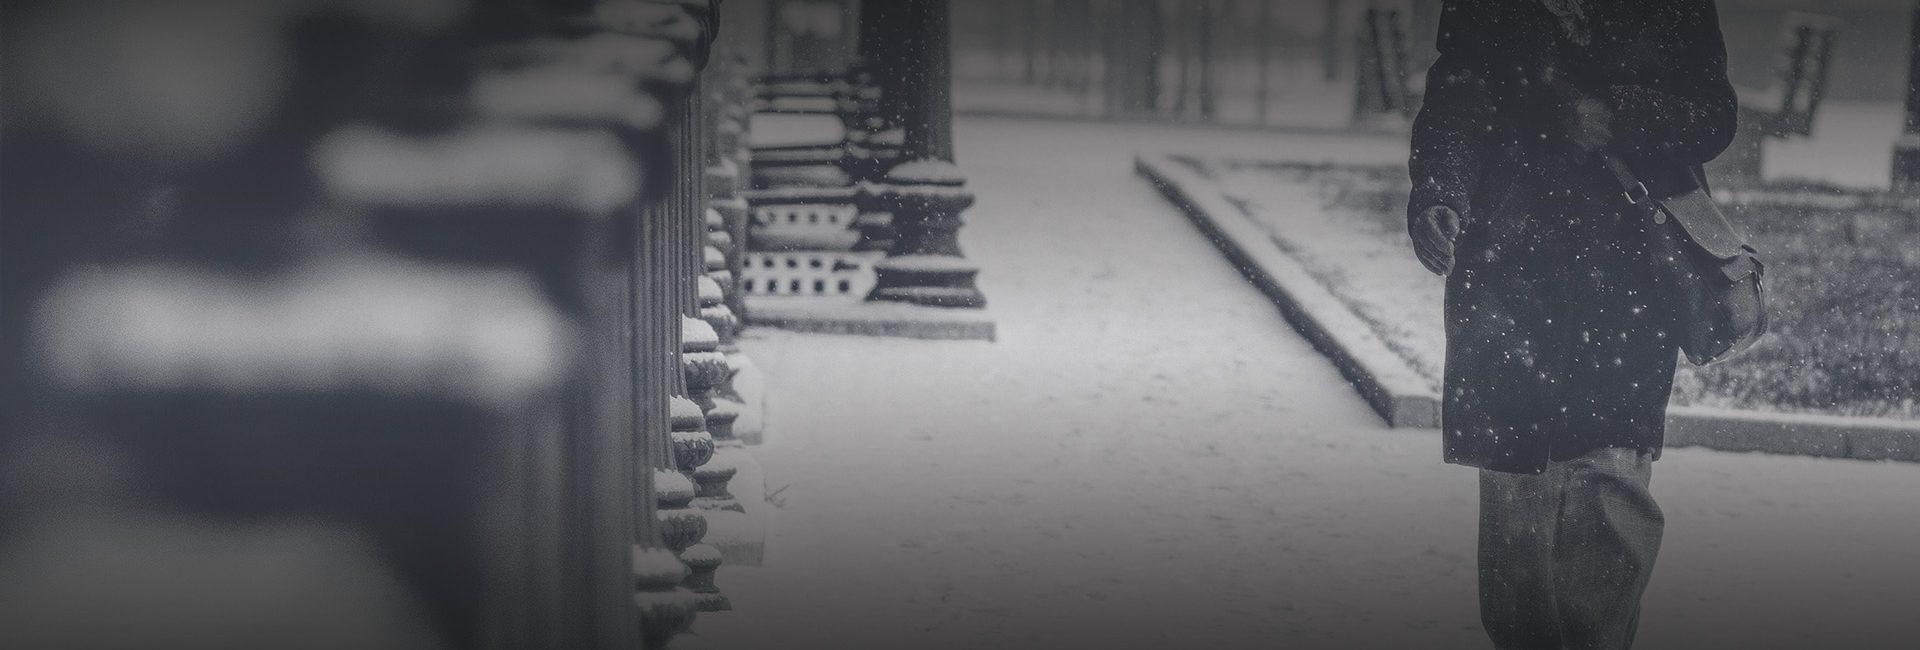 Storm Recap for January 31 – February 1, 2019